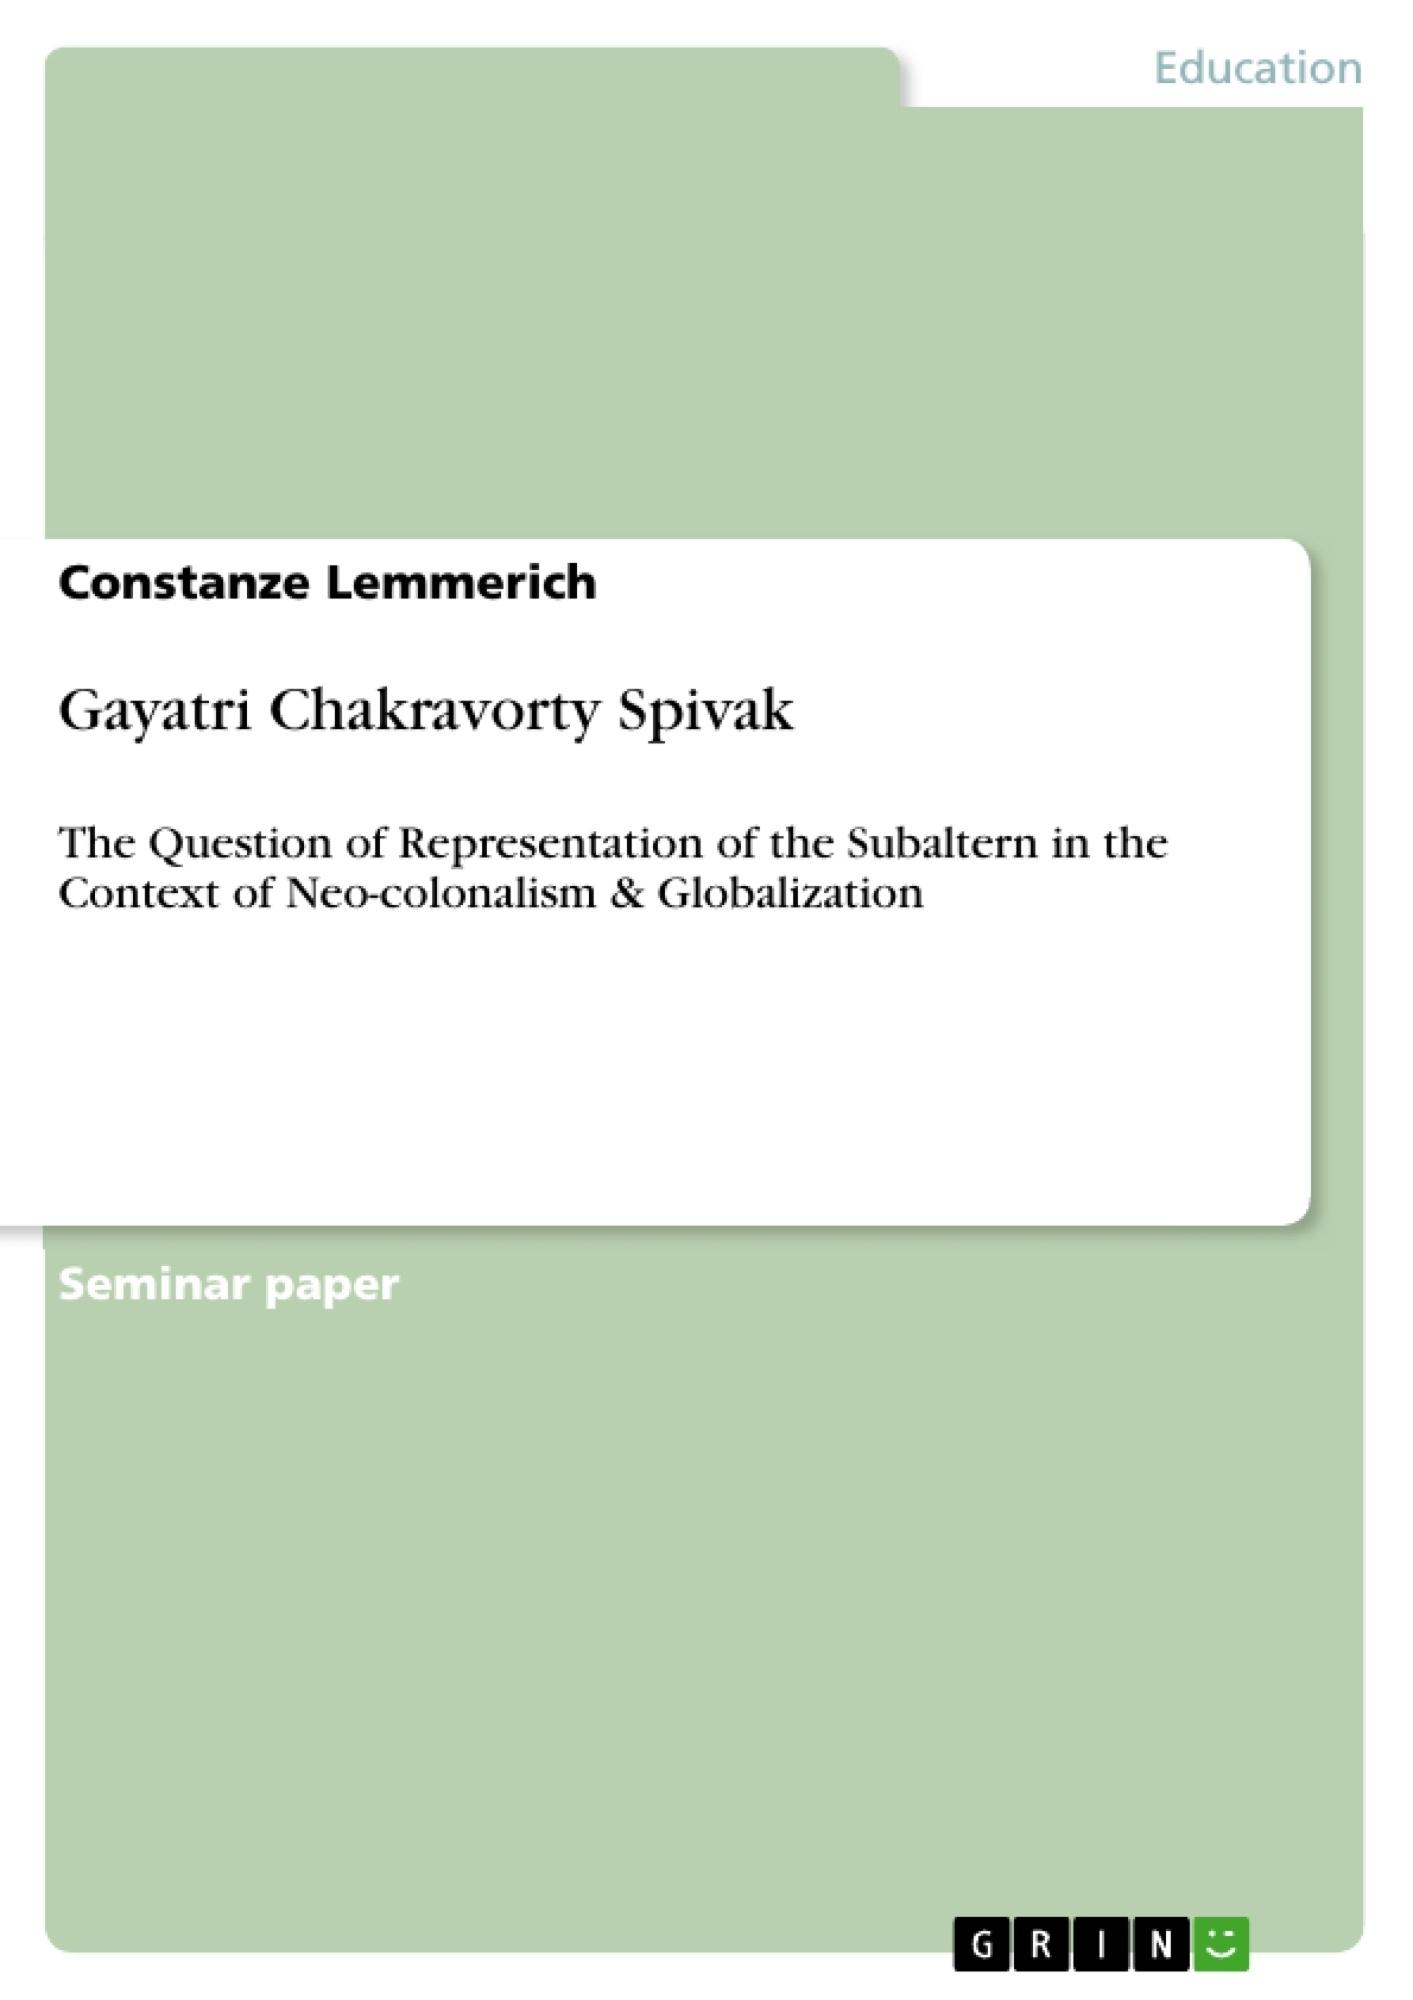 Title: Gayatri Chakravorty Spivak